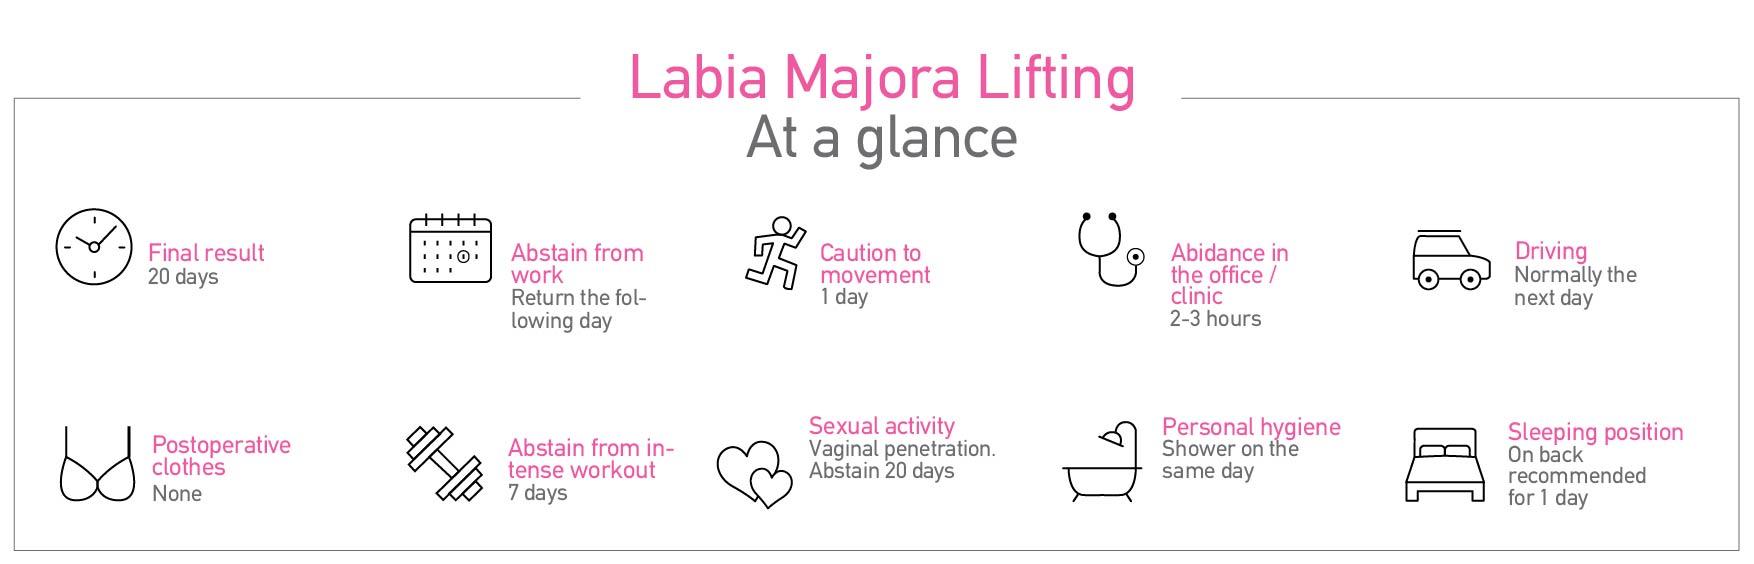 Labia Majora Lifting